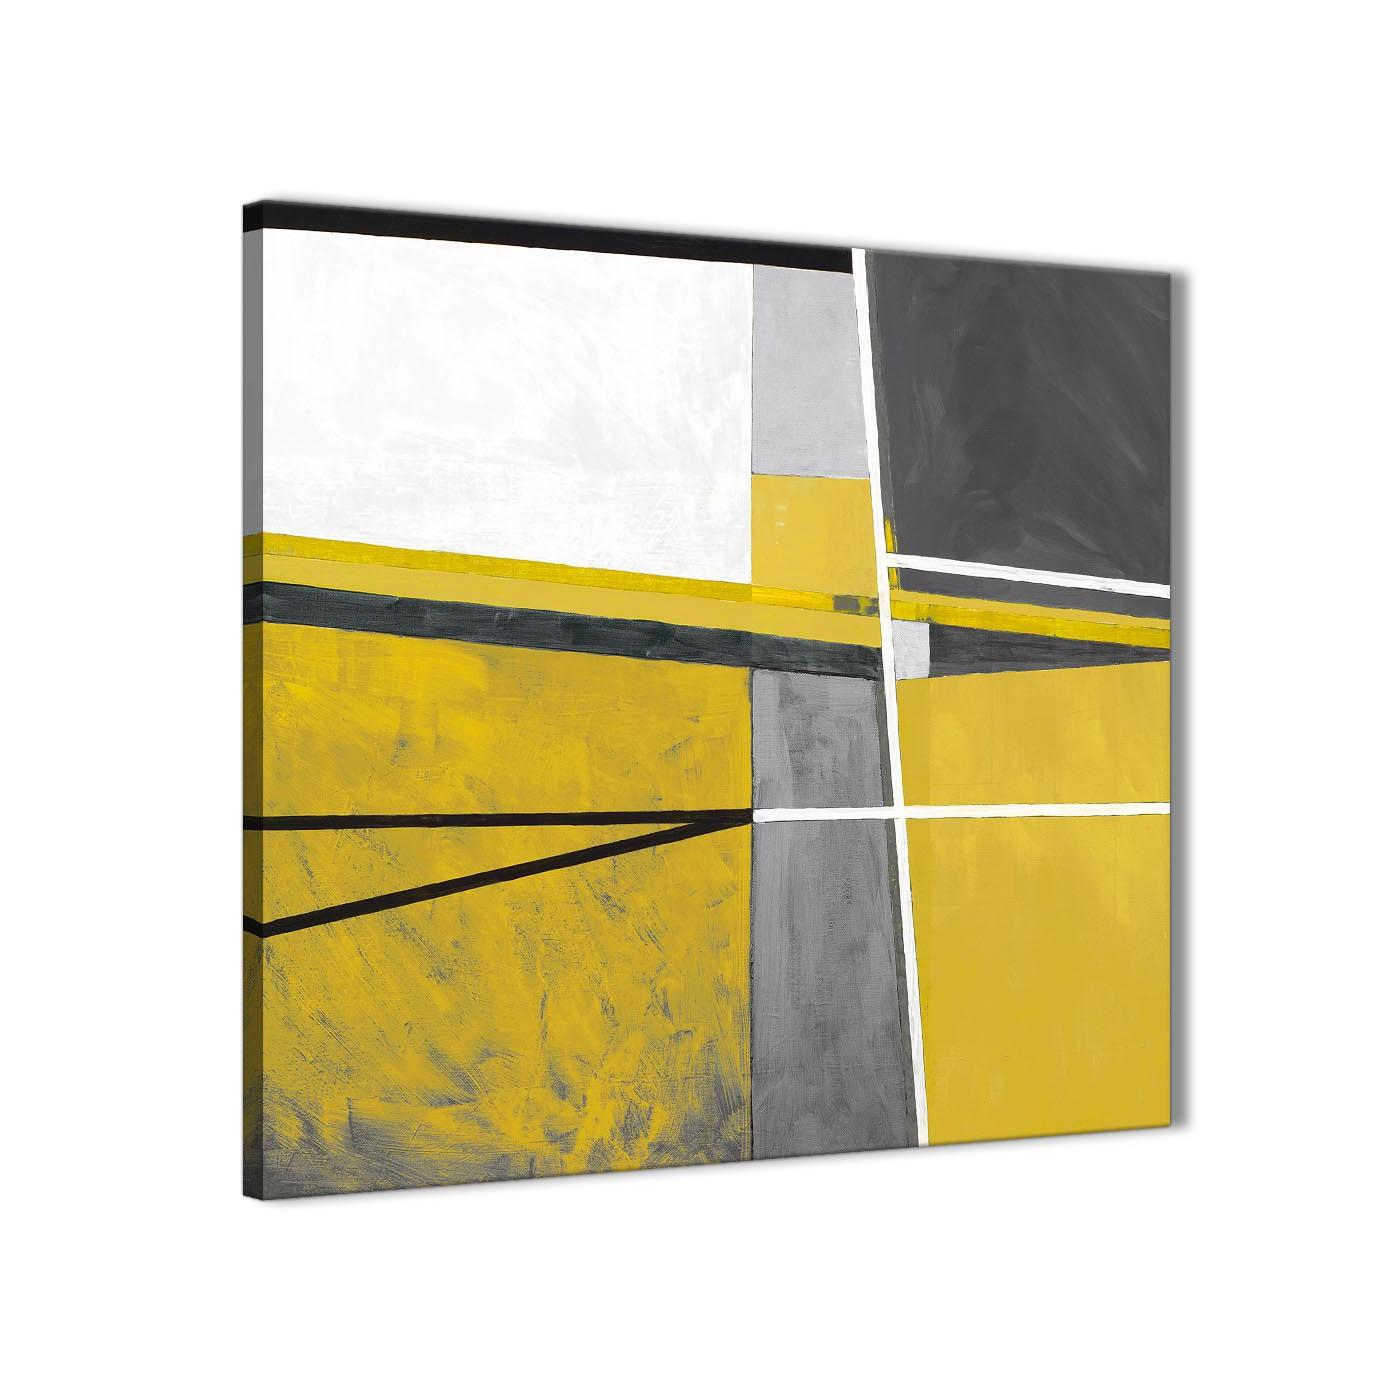 Fine Framed Wall Art For Living Room Uk Elaboration - Art & Wall ...